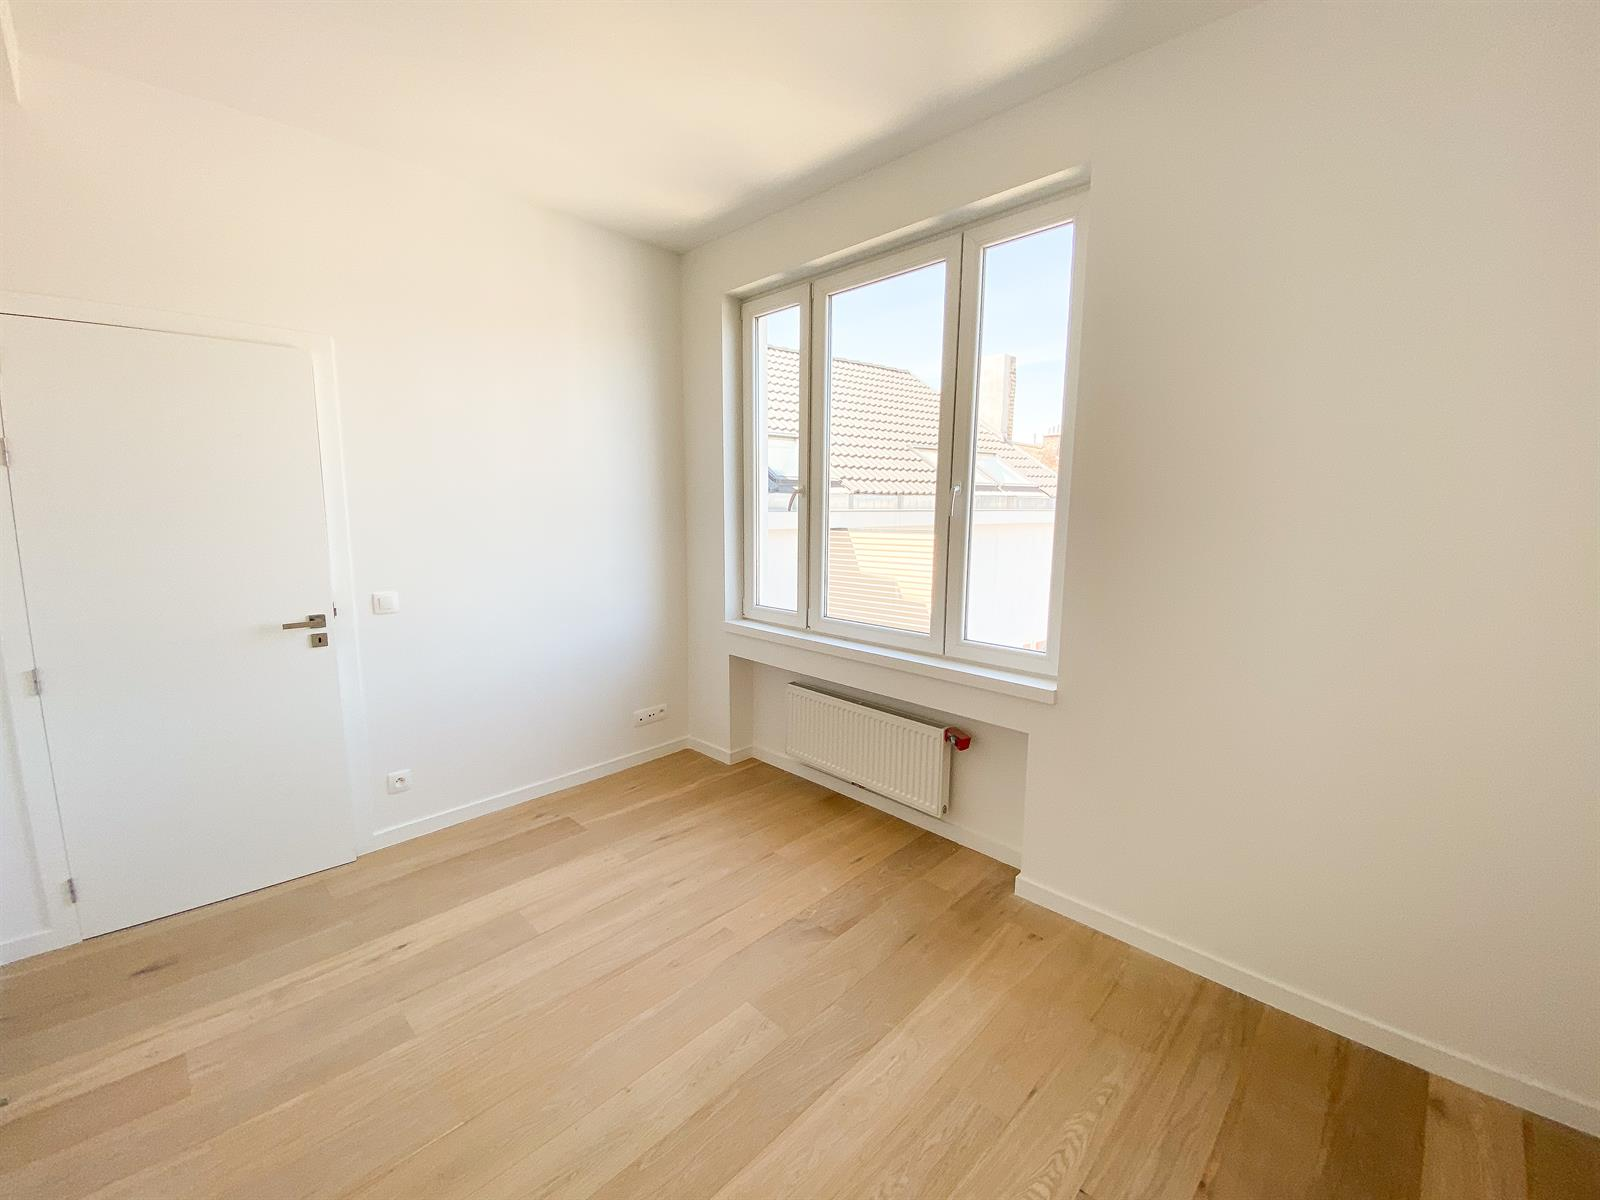 Appartement - Liège - #4045805-11